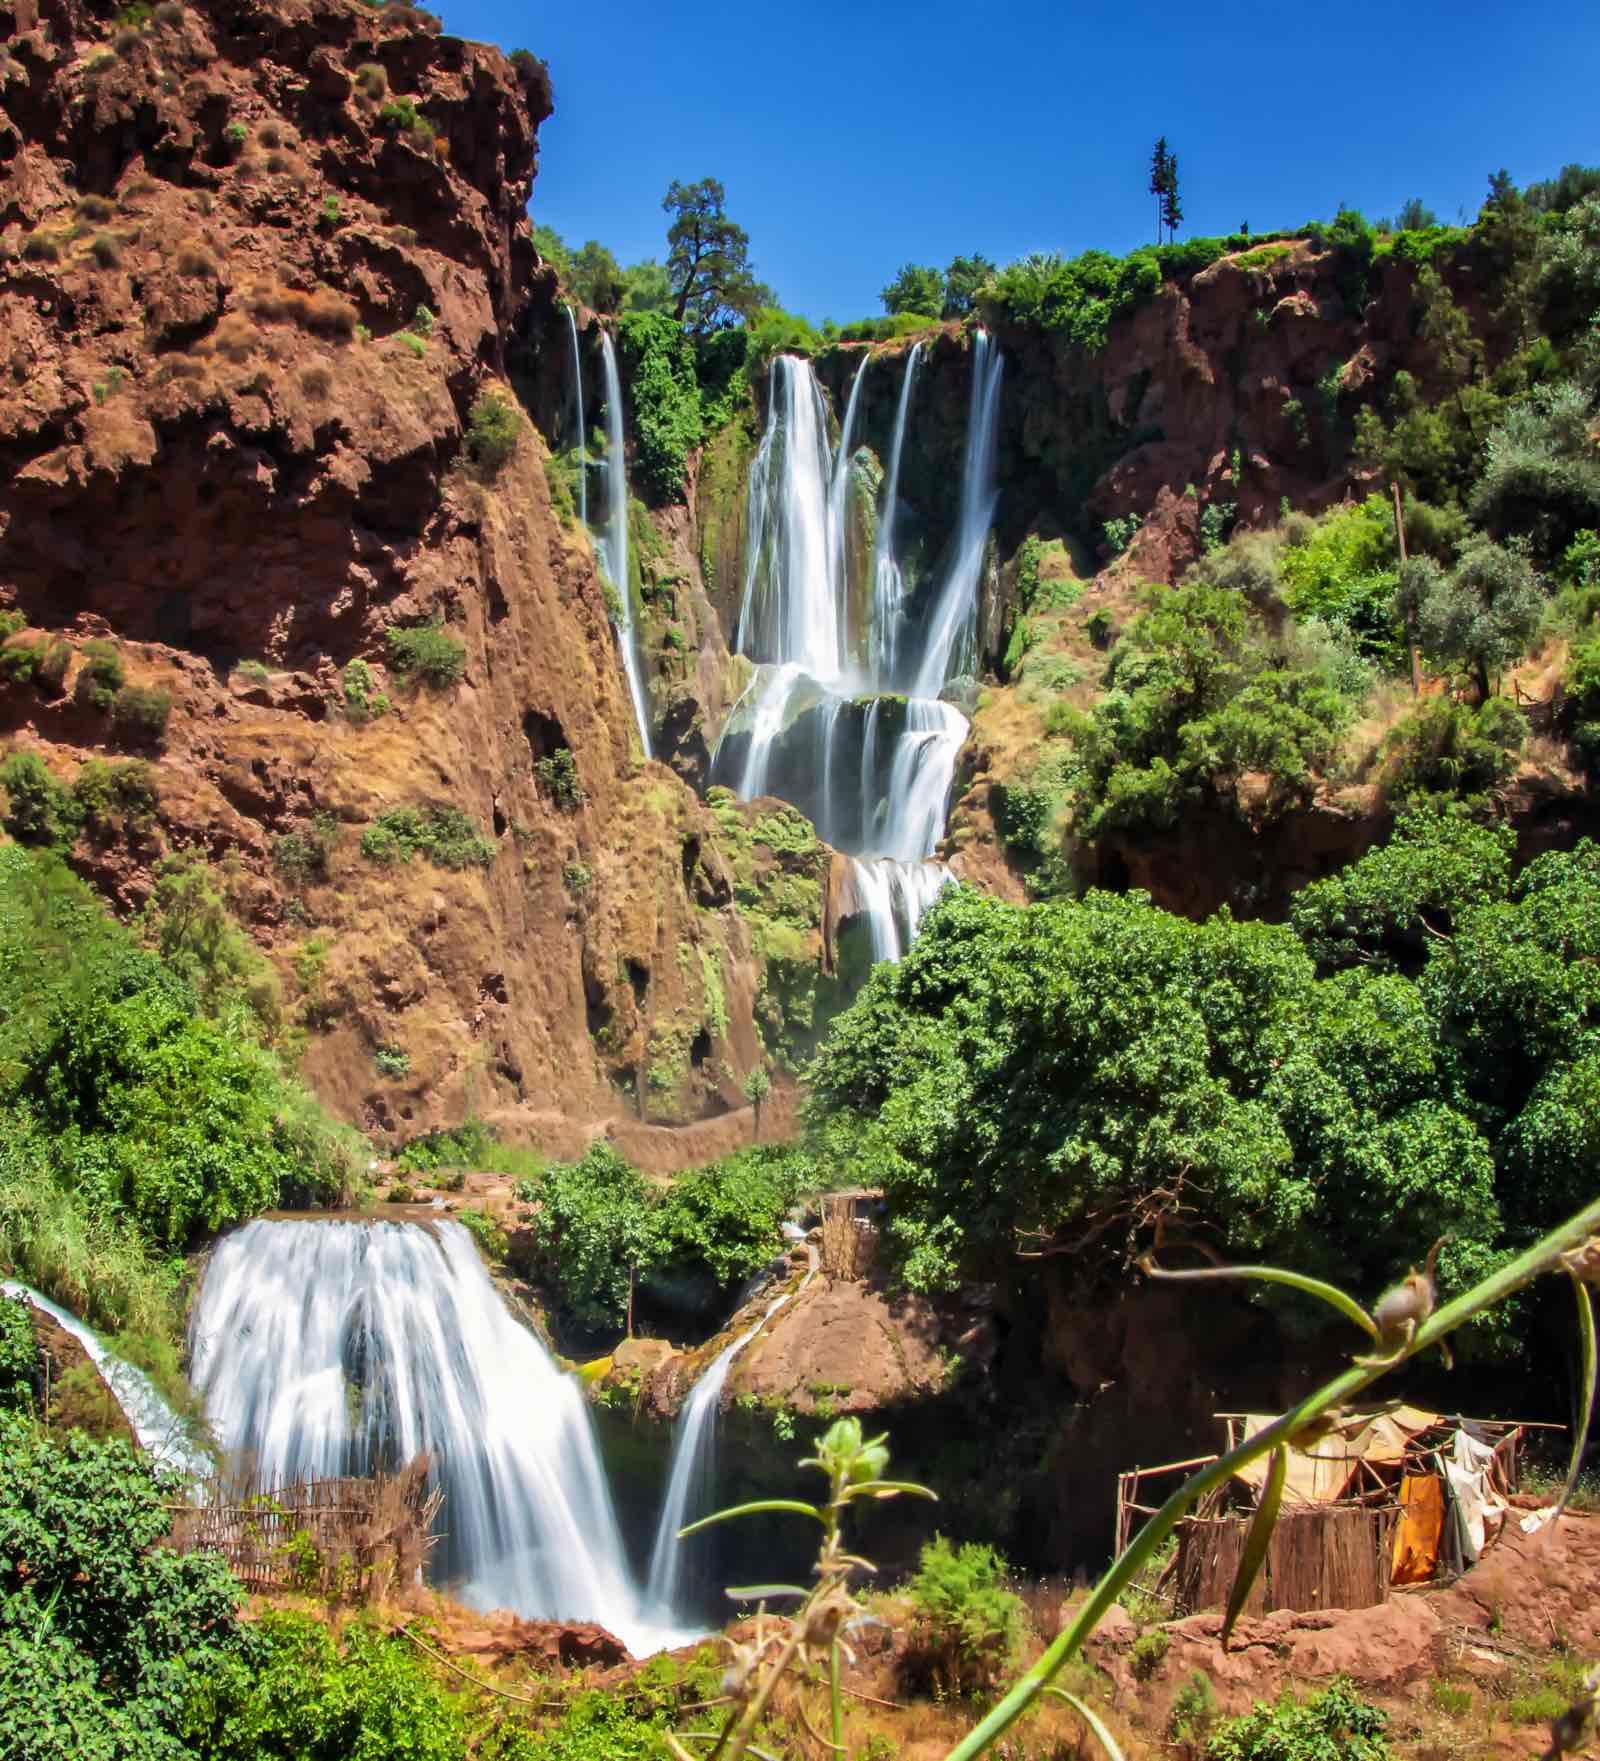 Ouzoud vandfald Marokko Atlasbjergene